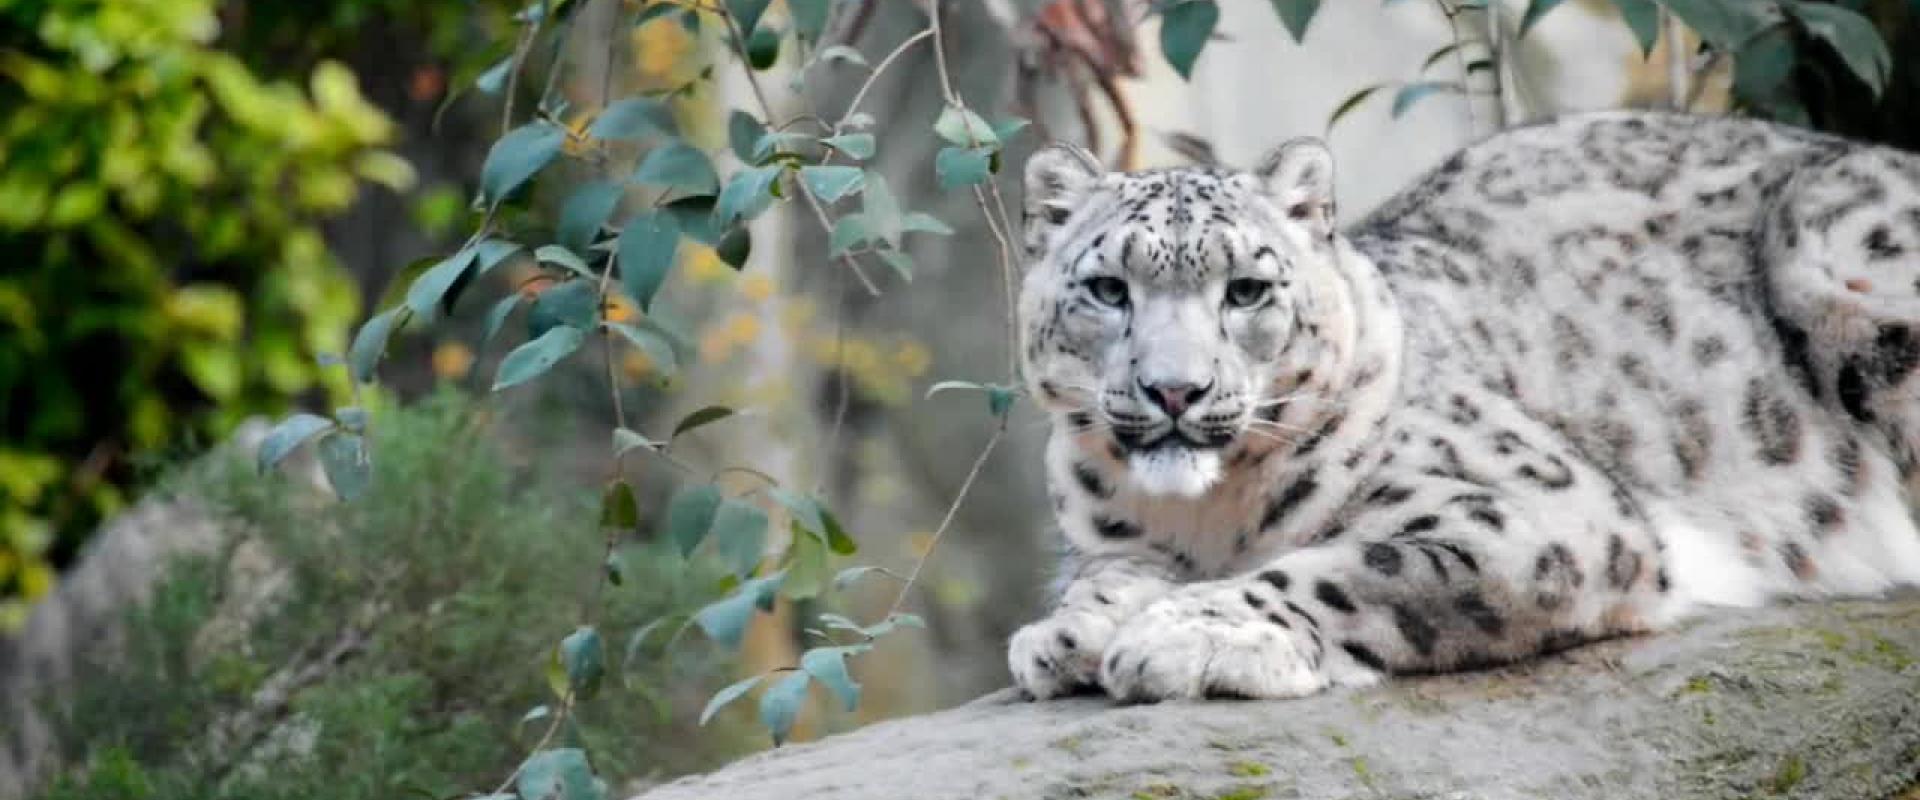 #LoveEarth - Leopardo delle nevi